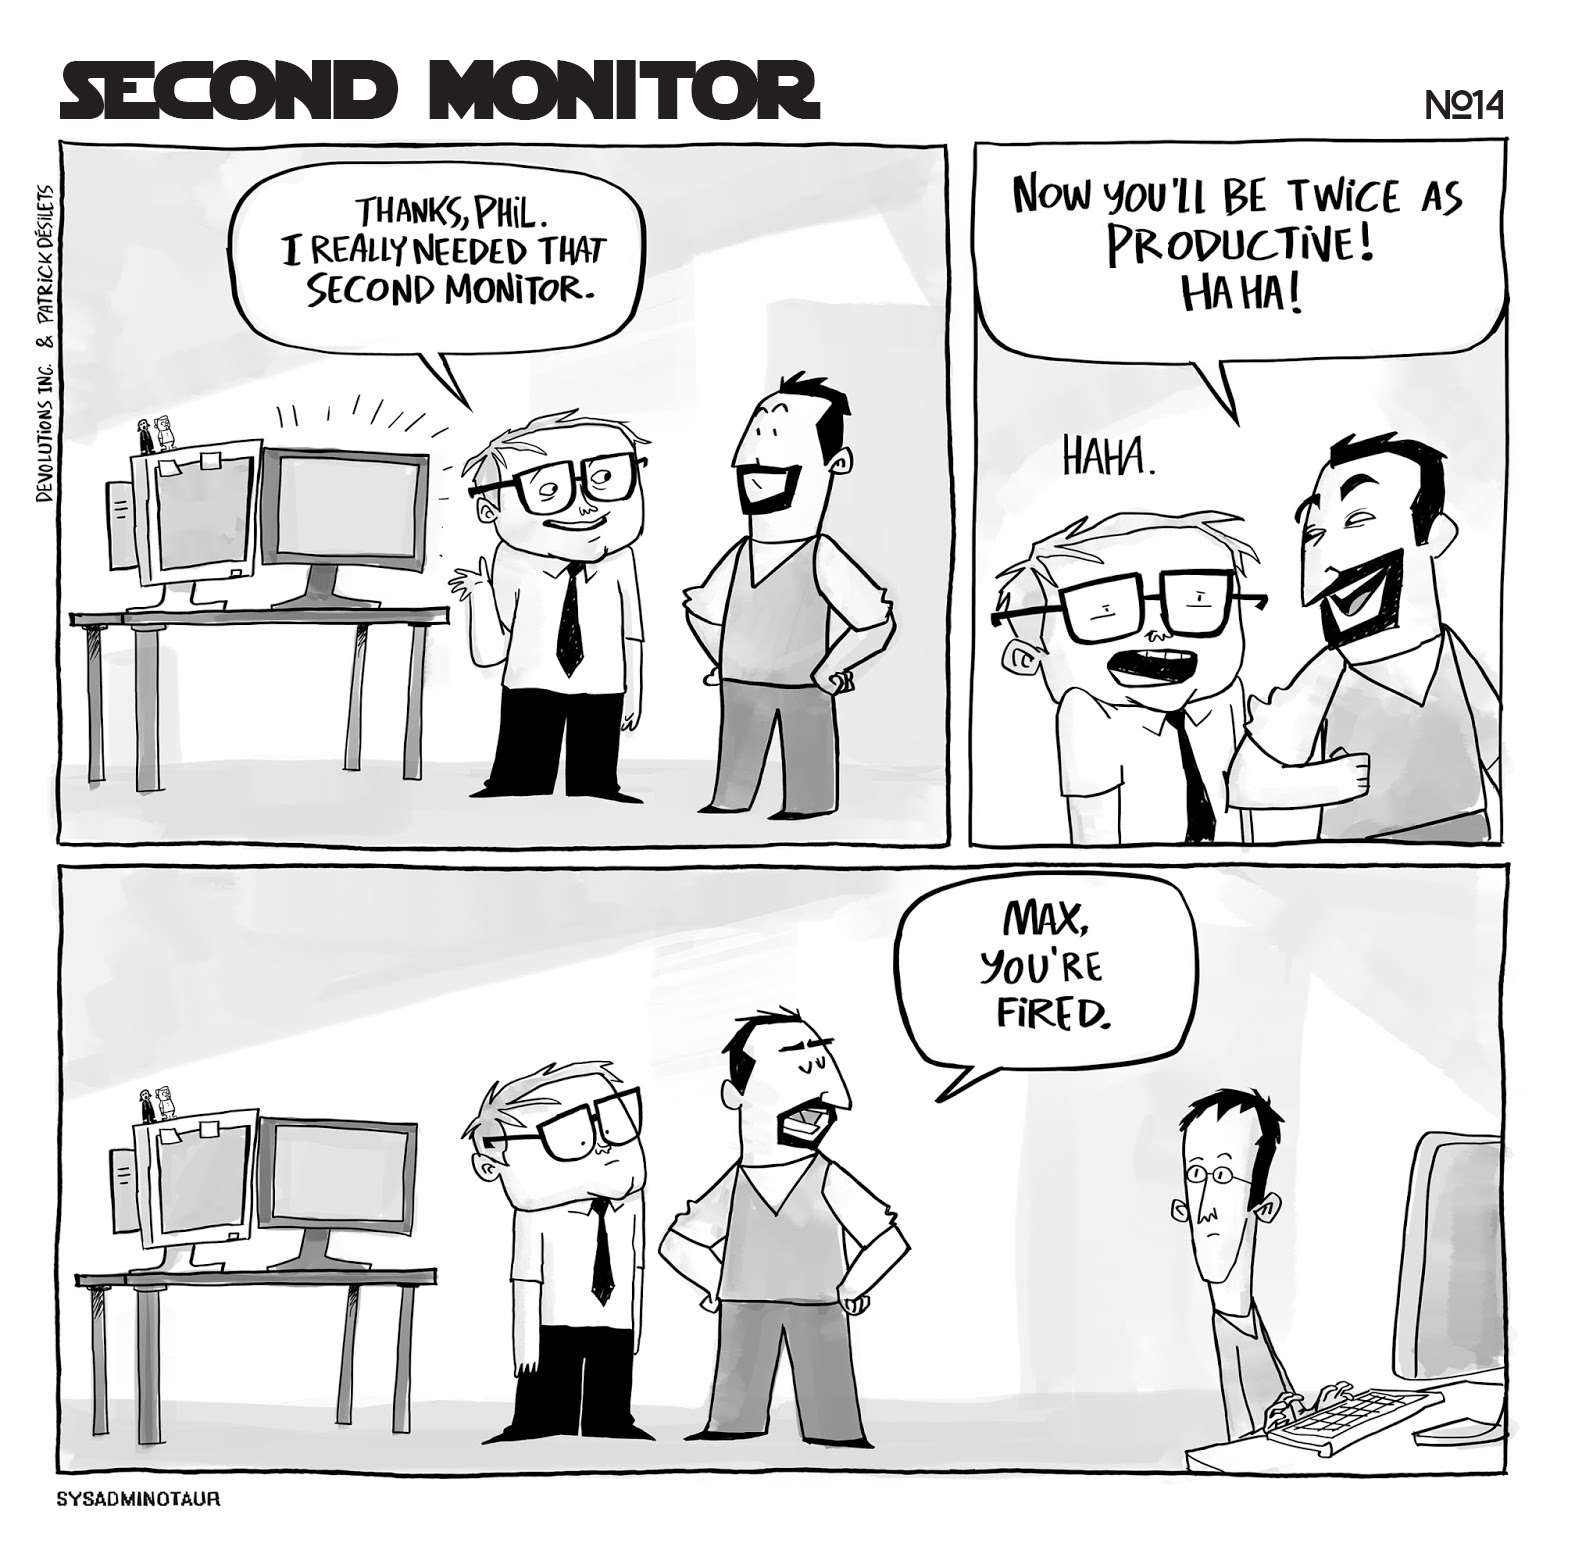 sysadminotaur-014-second-monitor